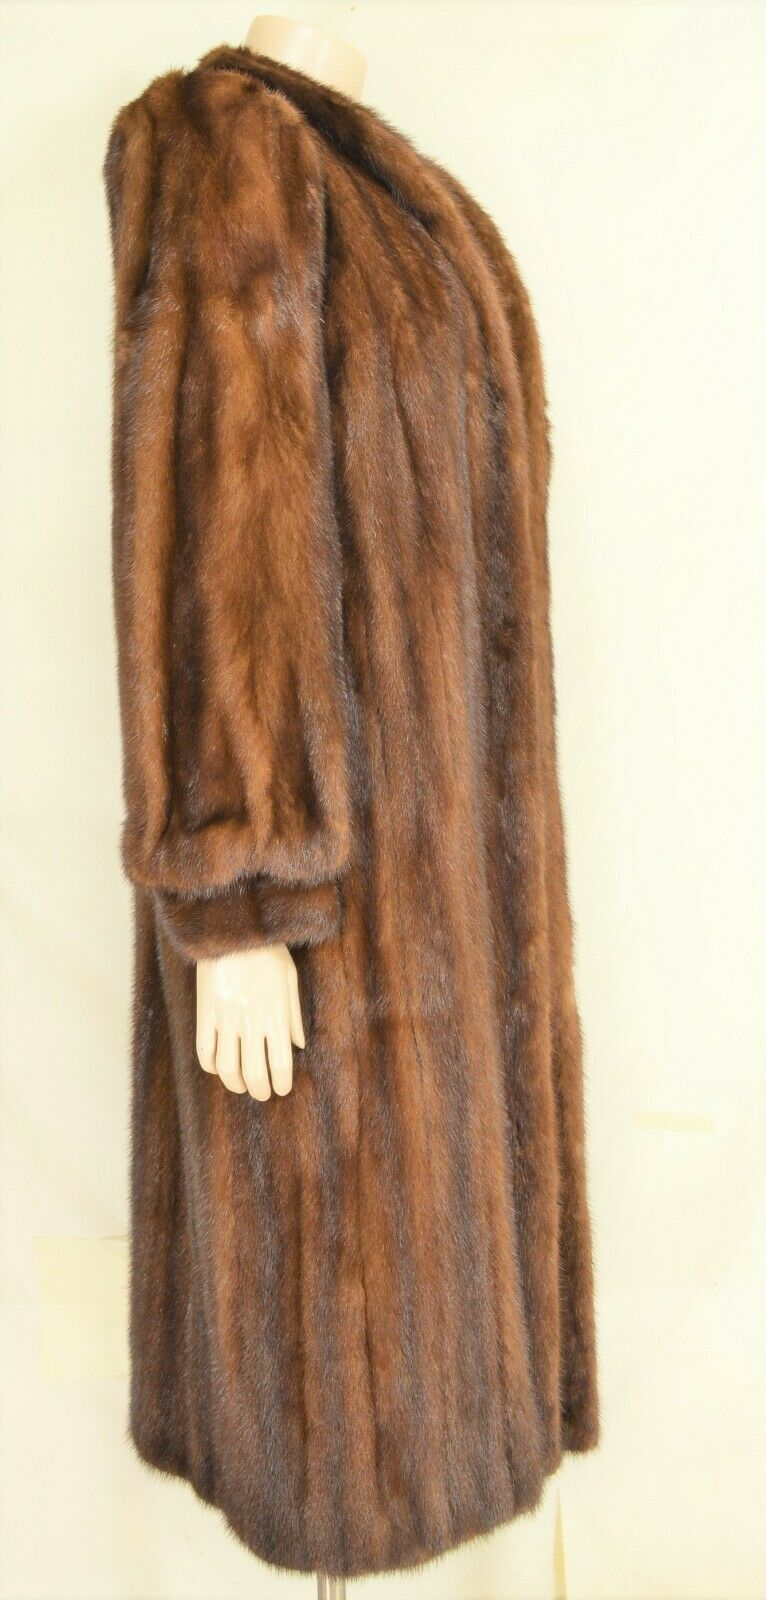 France Olivia mink fur coat FR 44 full length mahogany chic sophisticate brown image 2